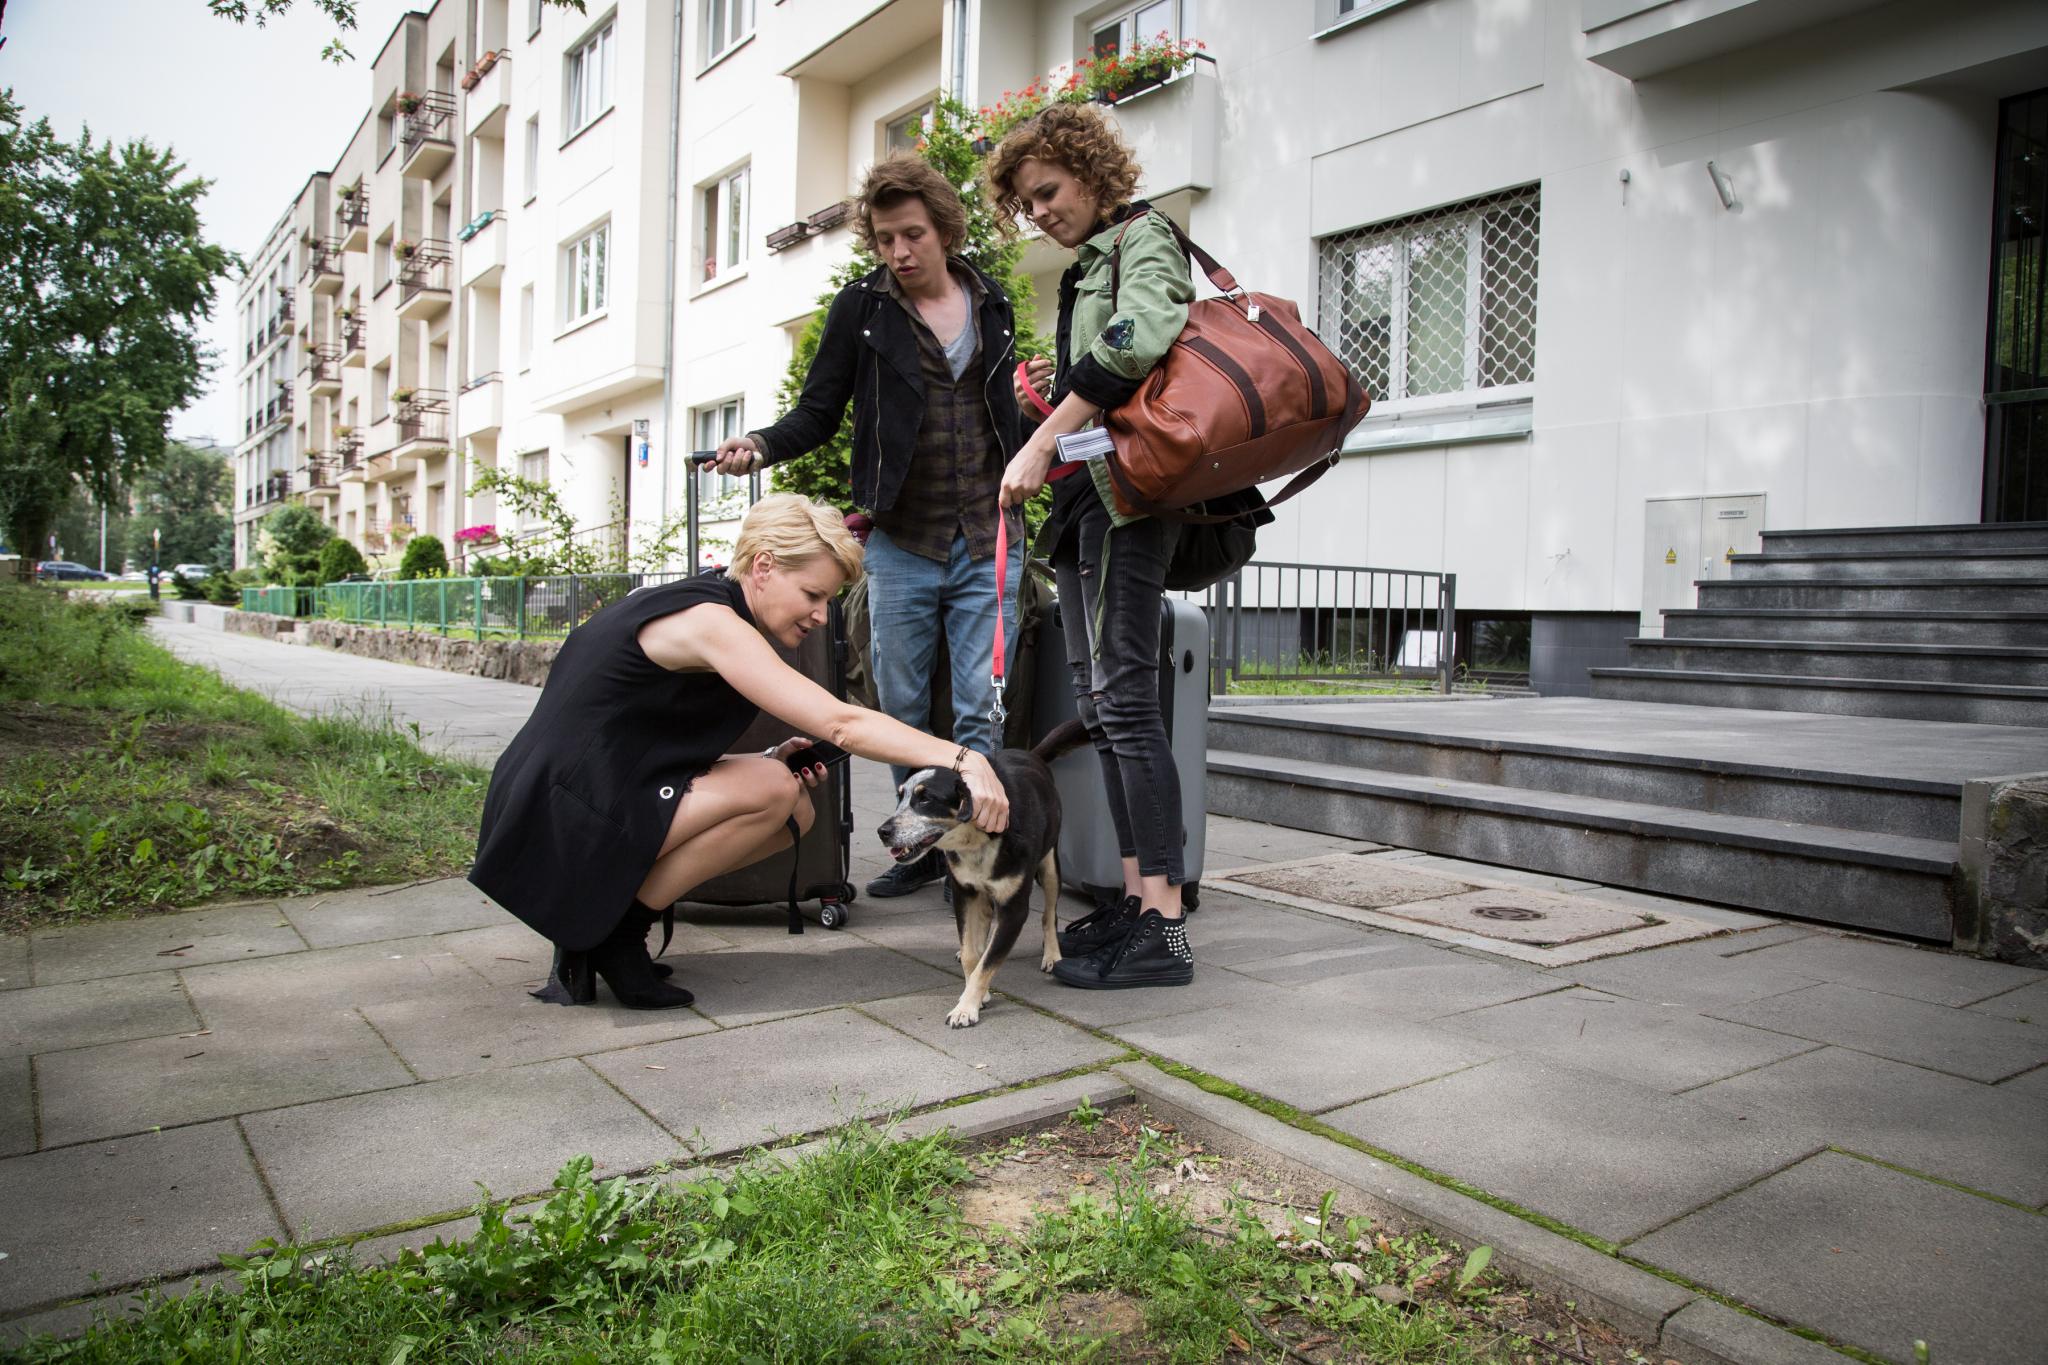 Druga szansa 4 - odcinek 1 - Justyna, Ksawery i Monika